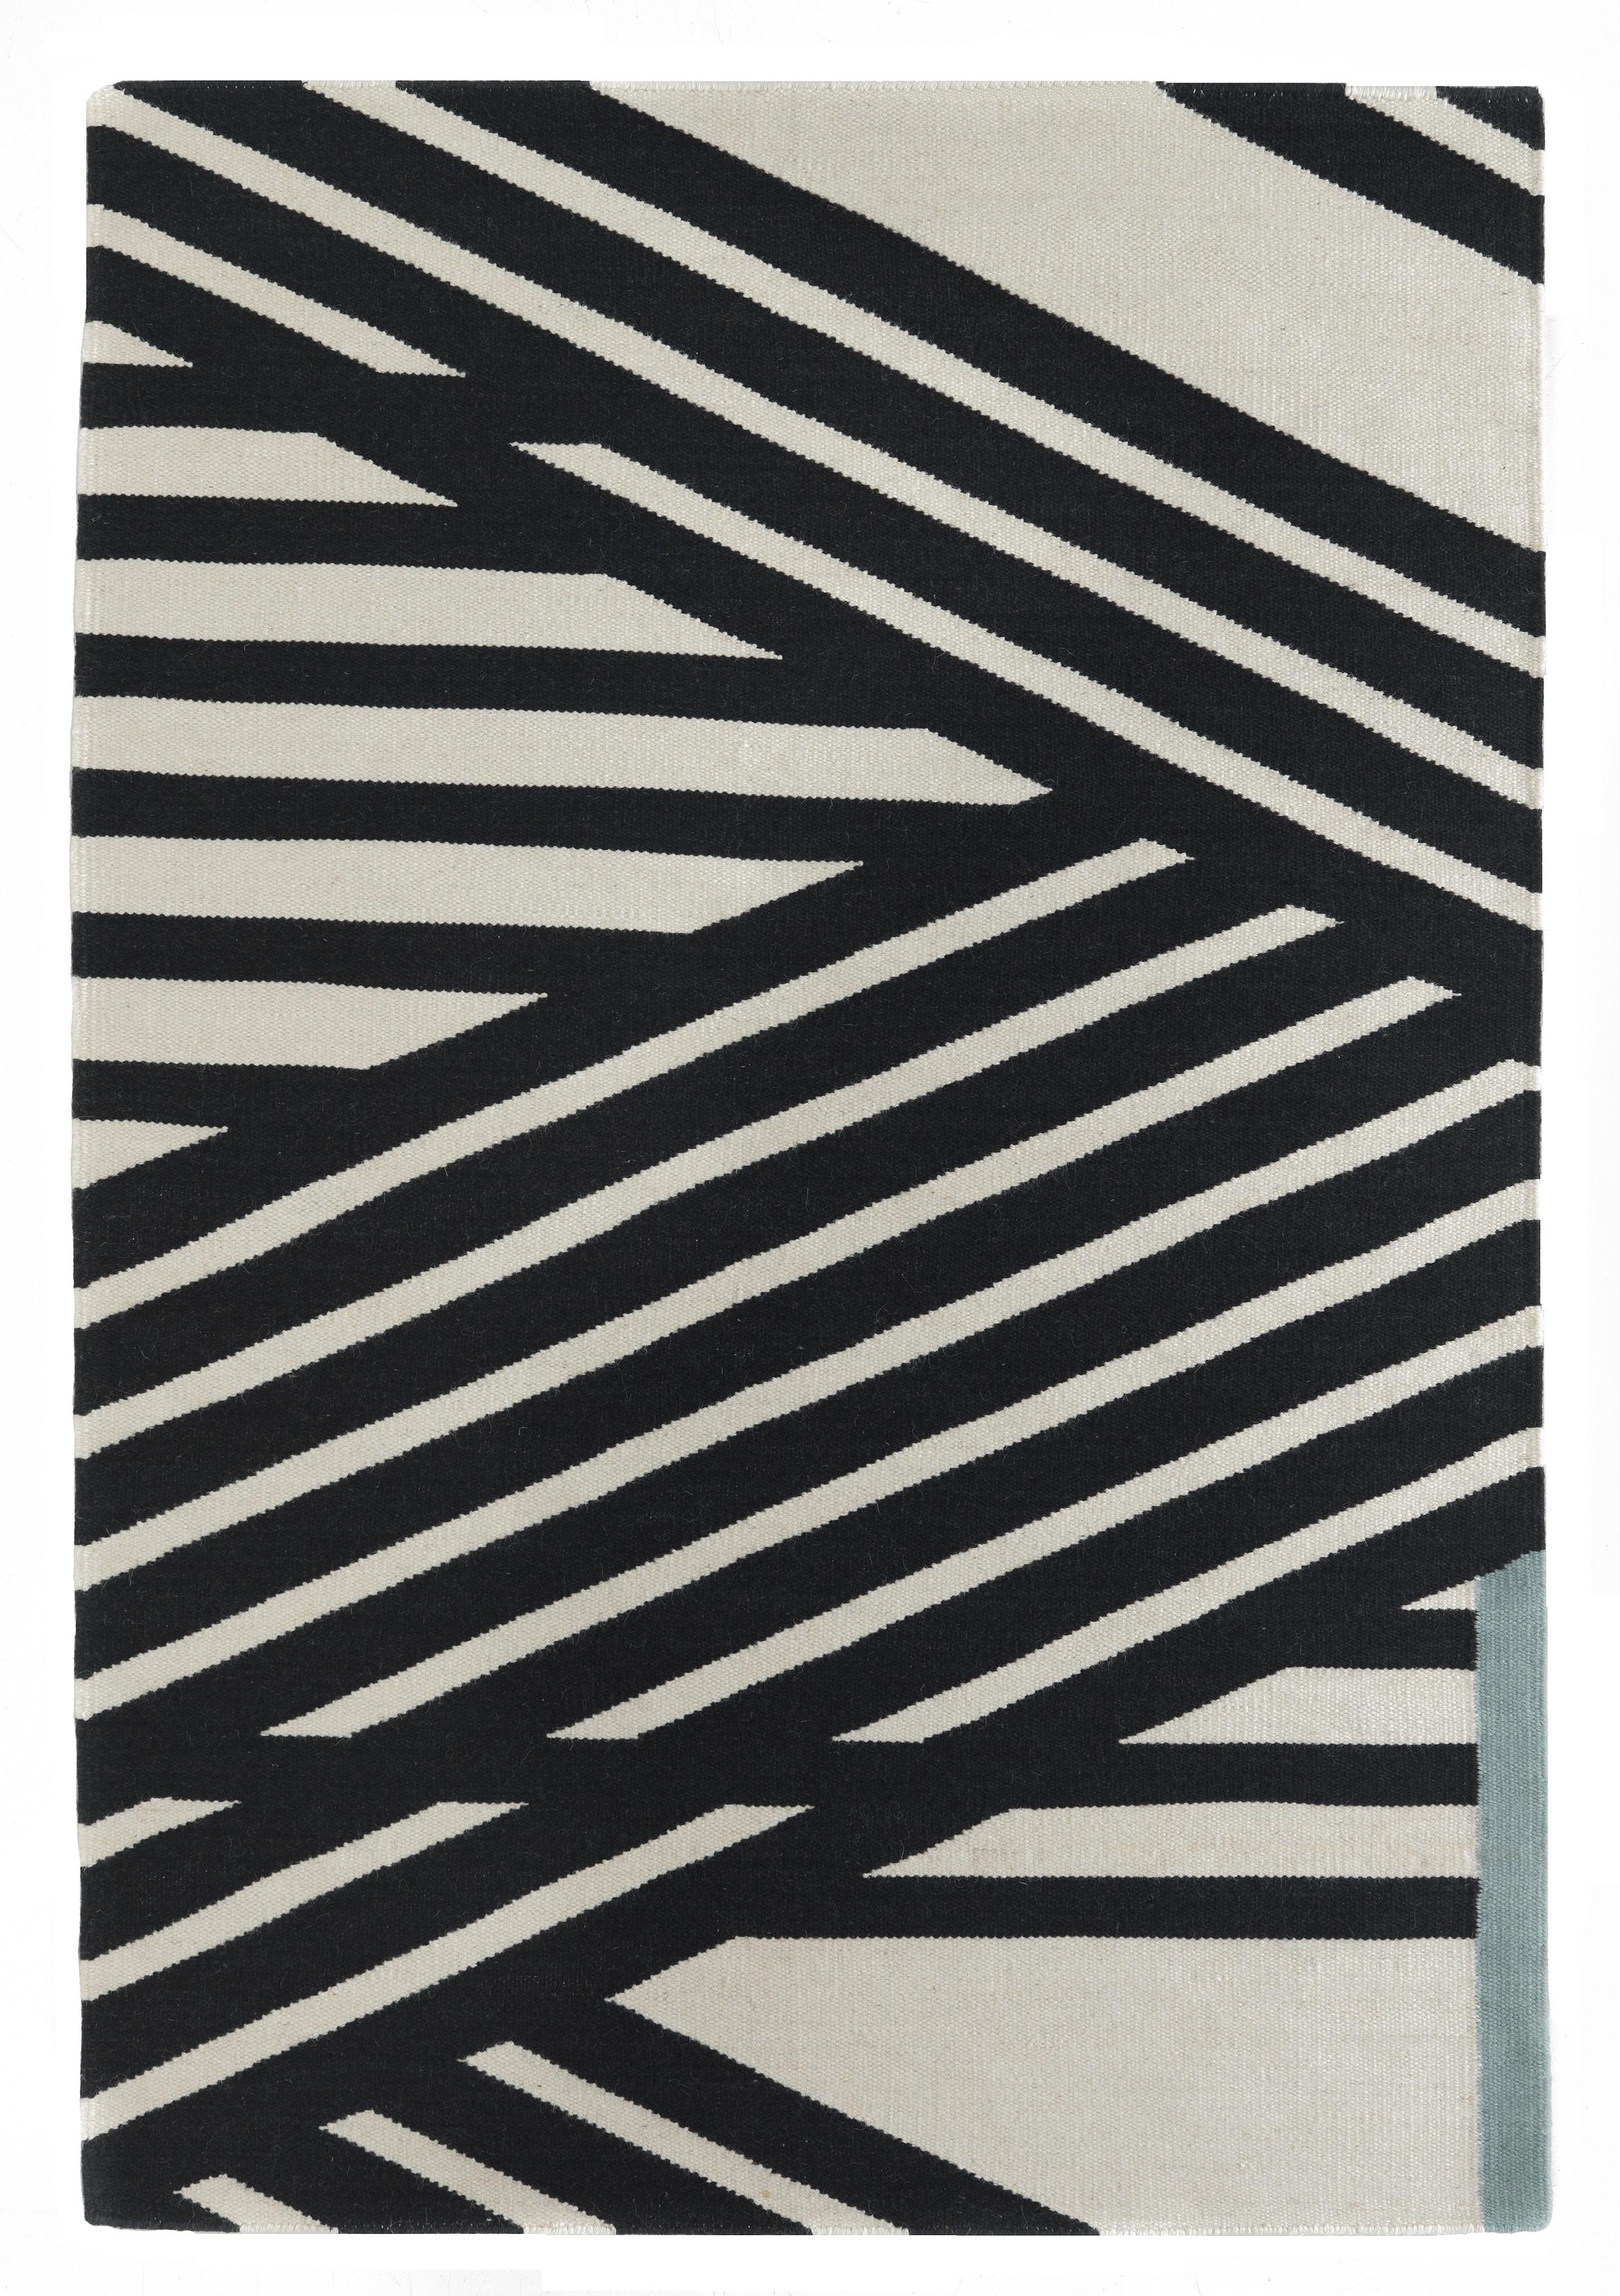 Tapis stripes 110x160